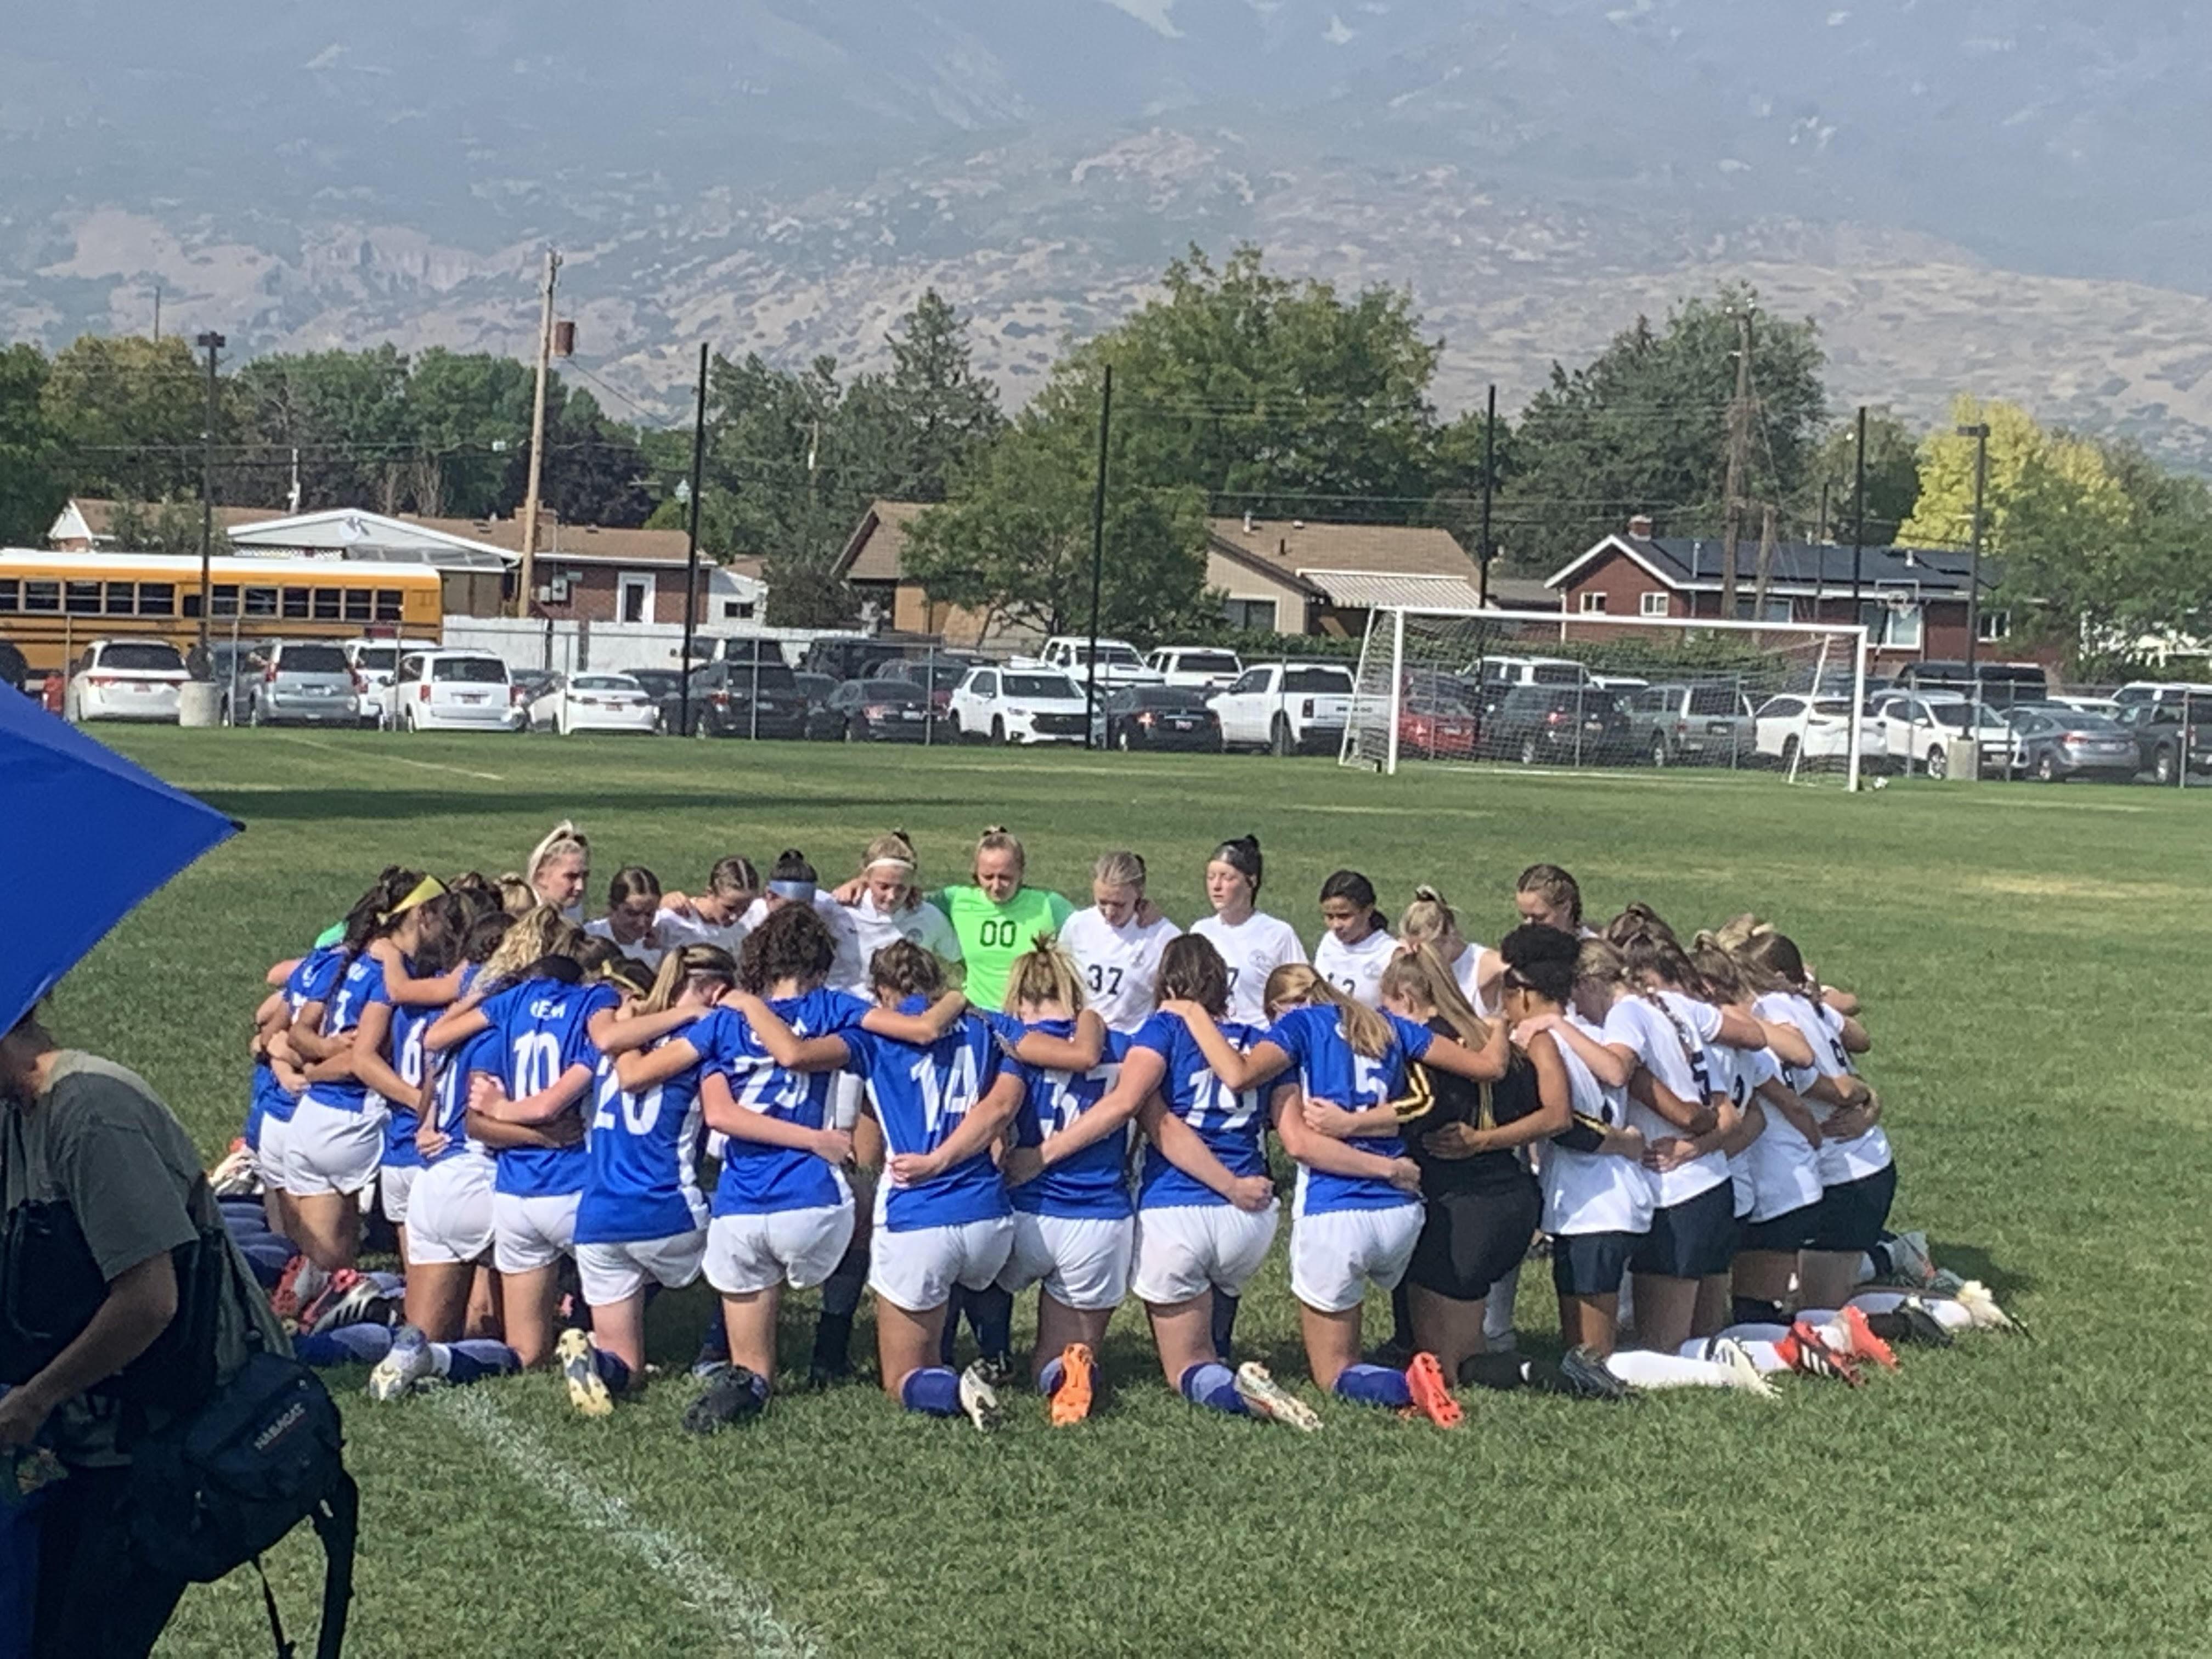 The Timpanogos High School varsity girls soccer team kneels in prayer with the opposing Orem High School team.